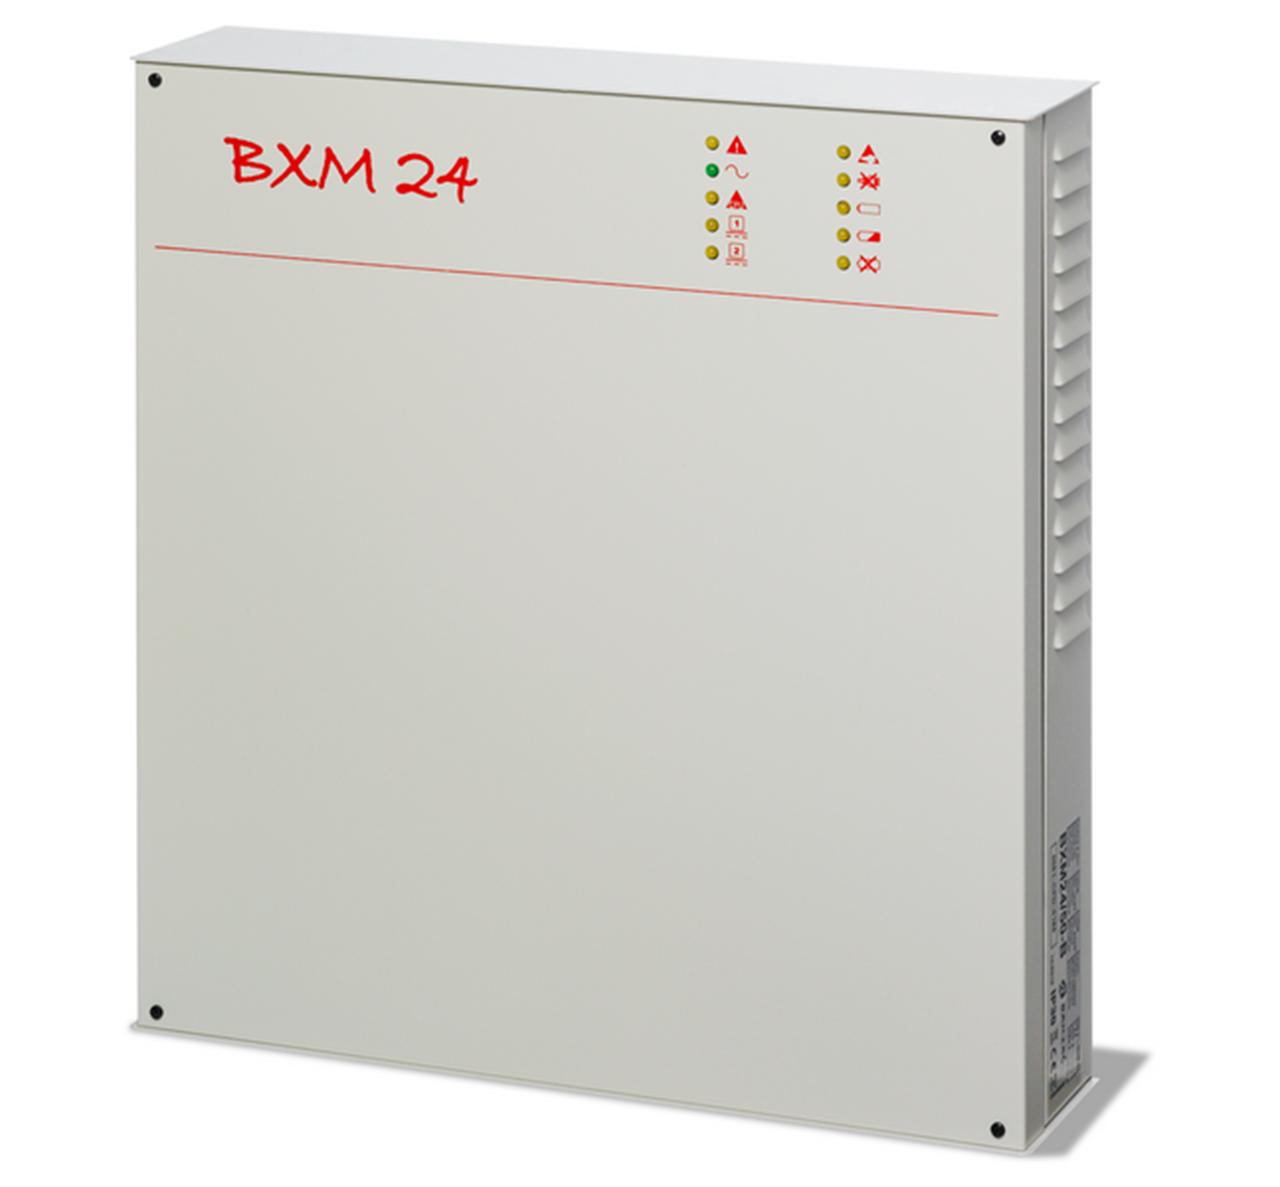 Bentel security BXM24/25-B - Microprocessor Controlled Power Station Armenia Vantag LLC